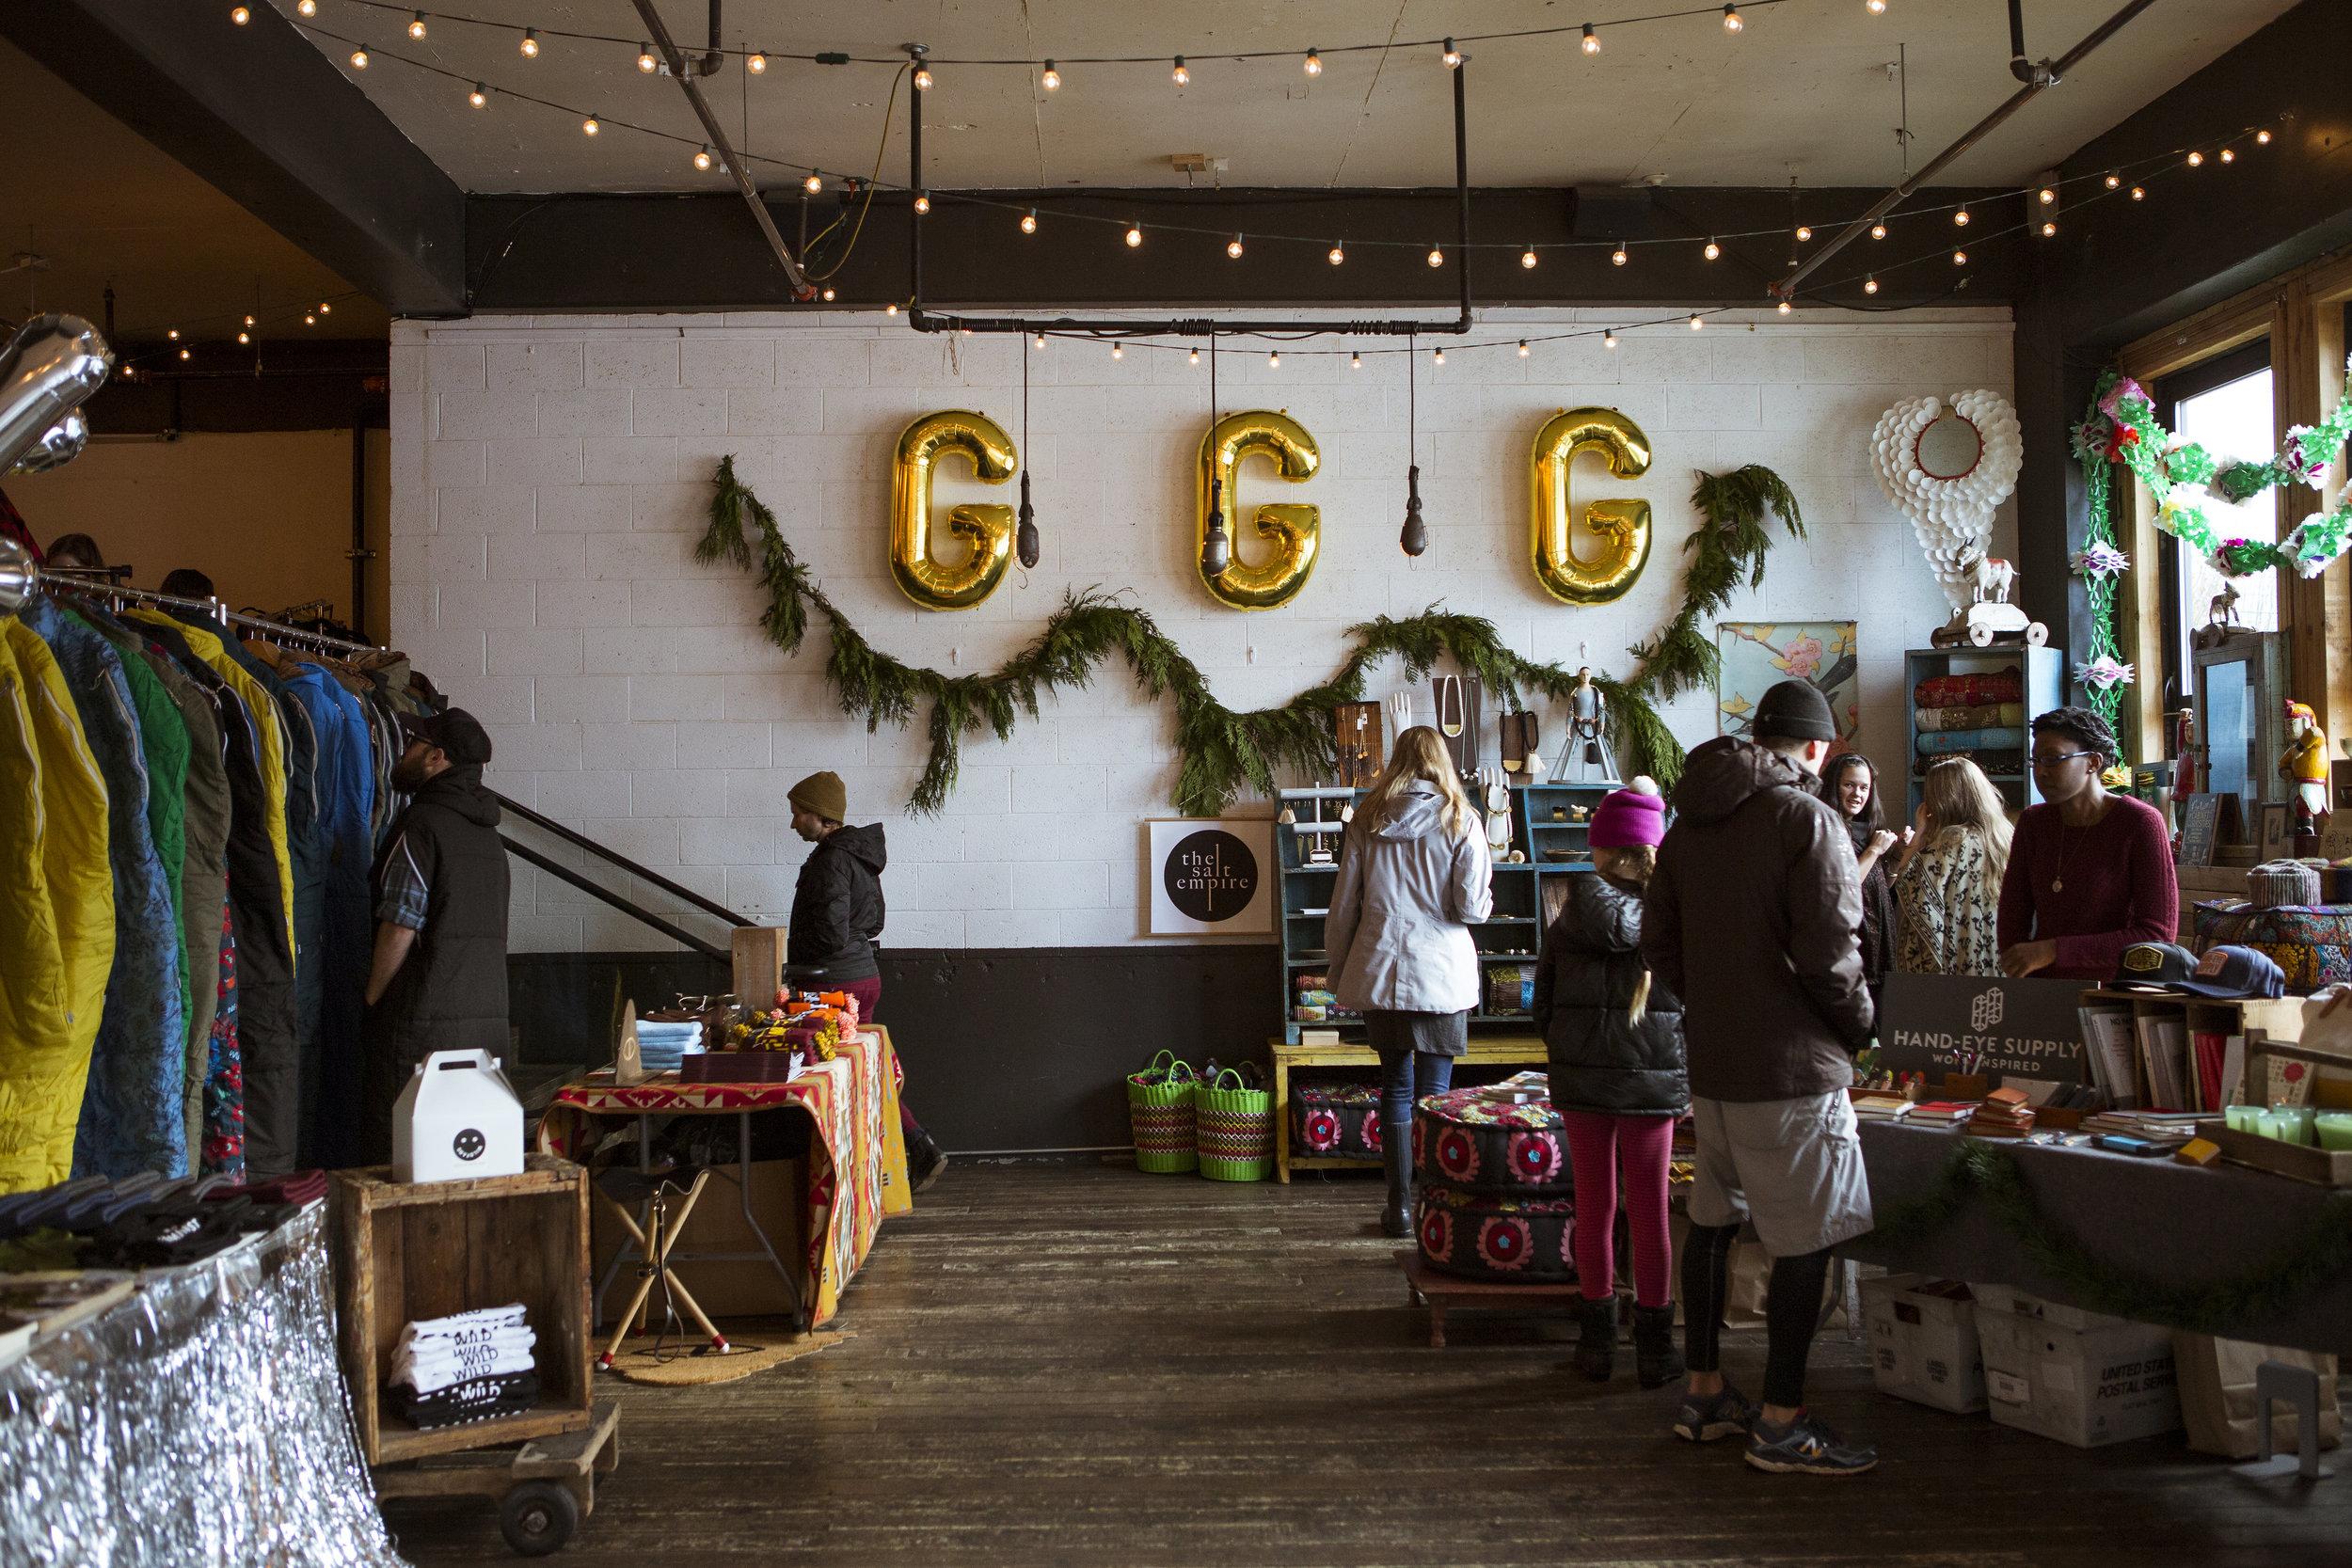 Give-Good-Gift-Portland-38.jpg